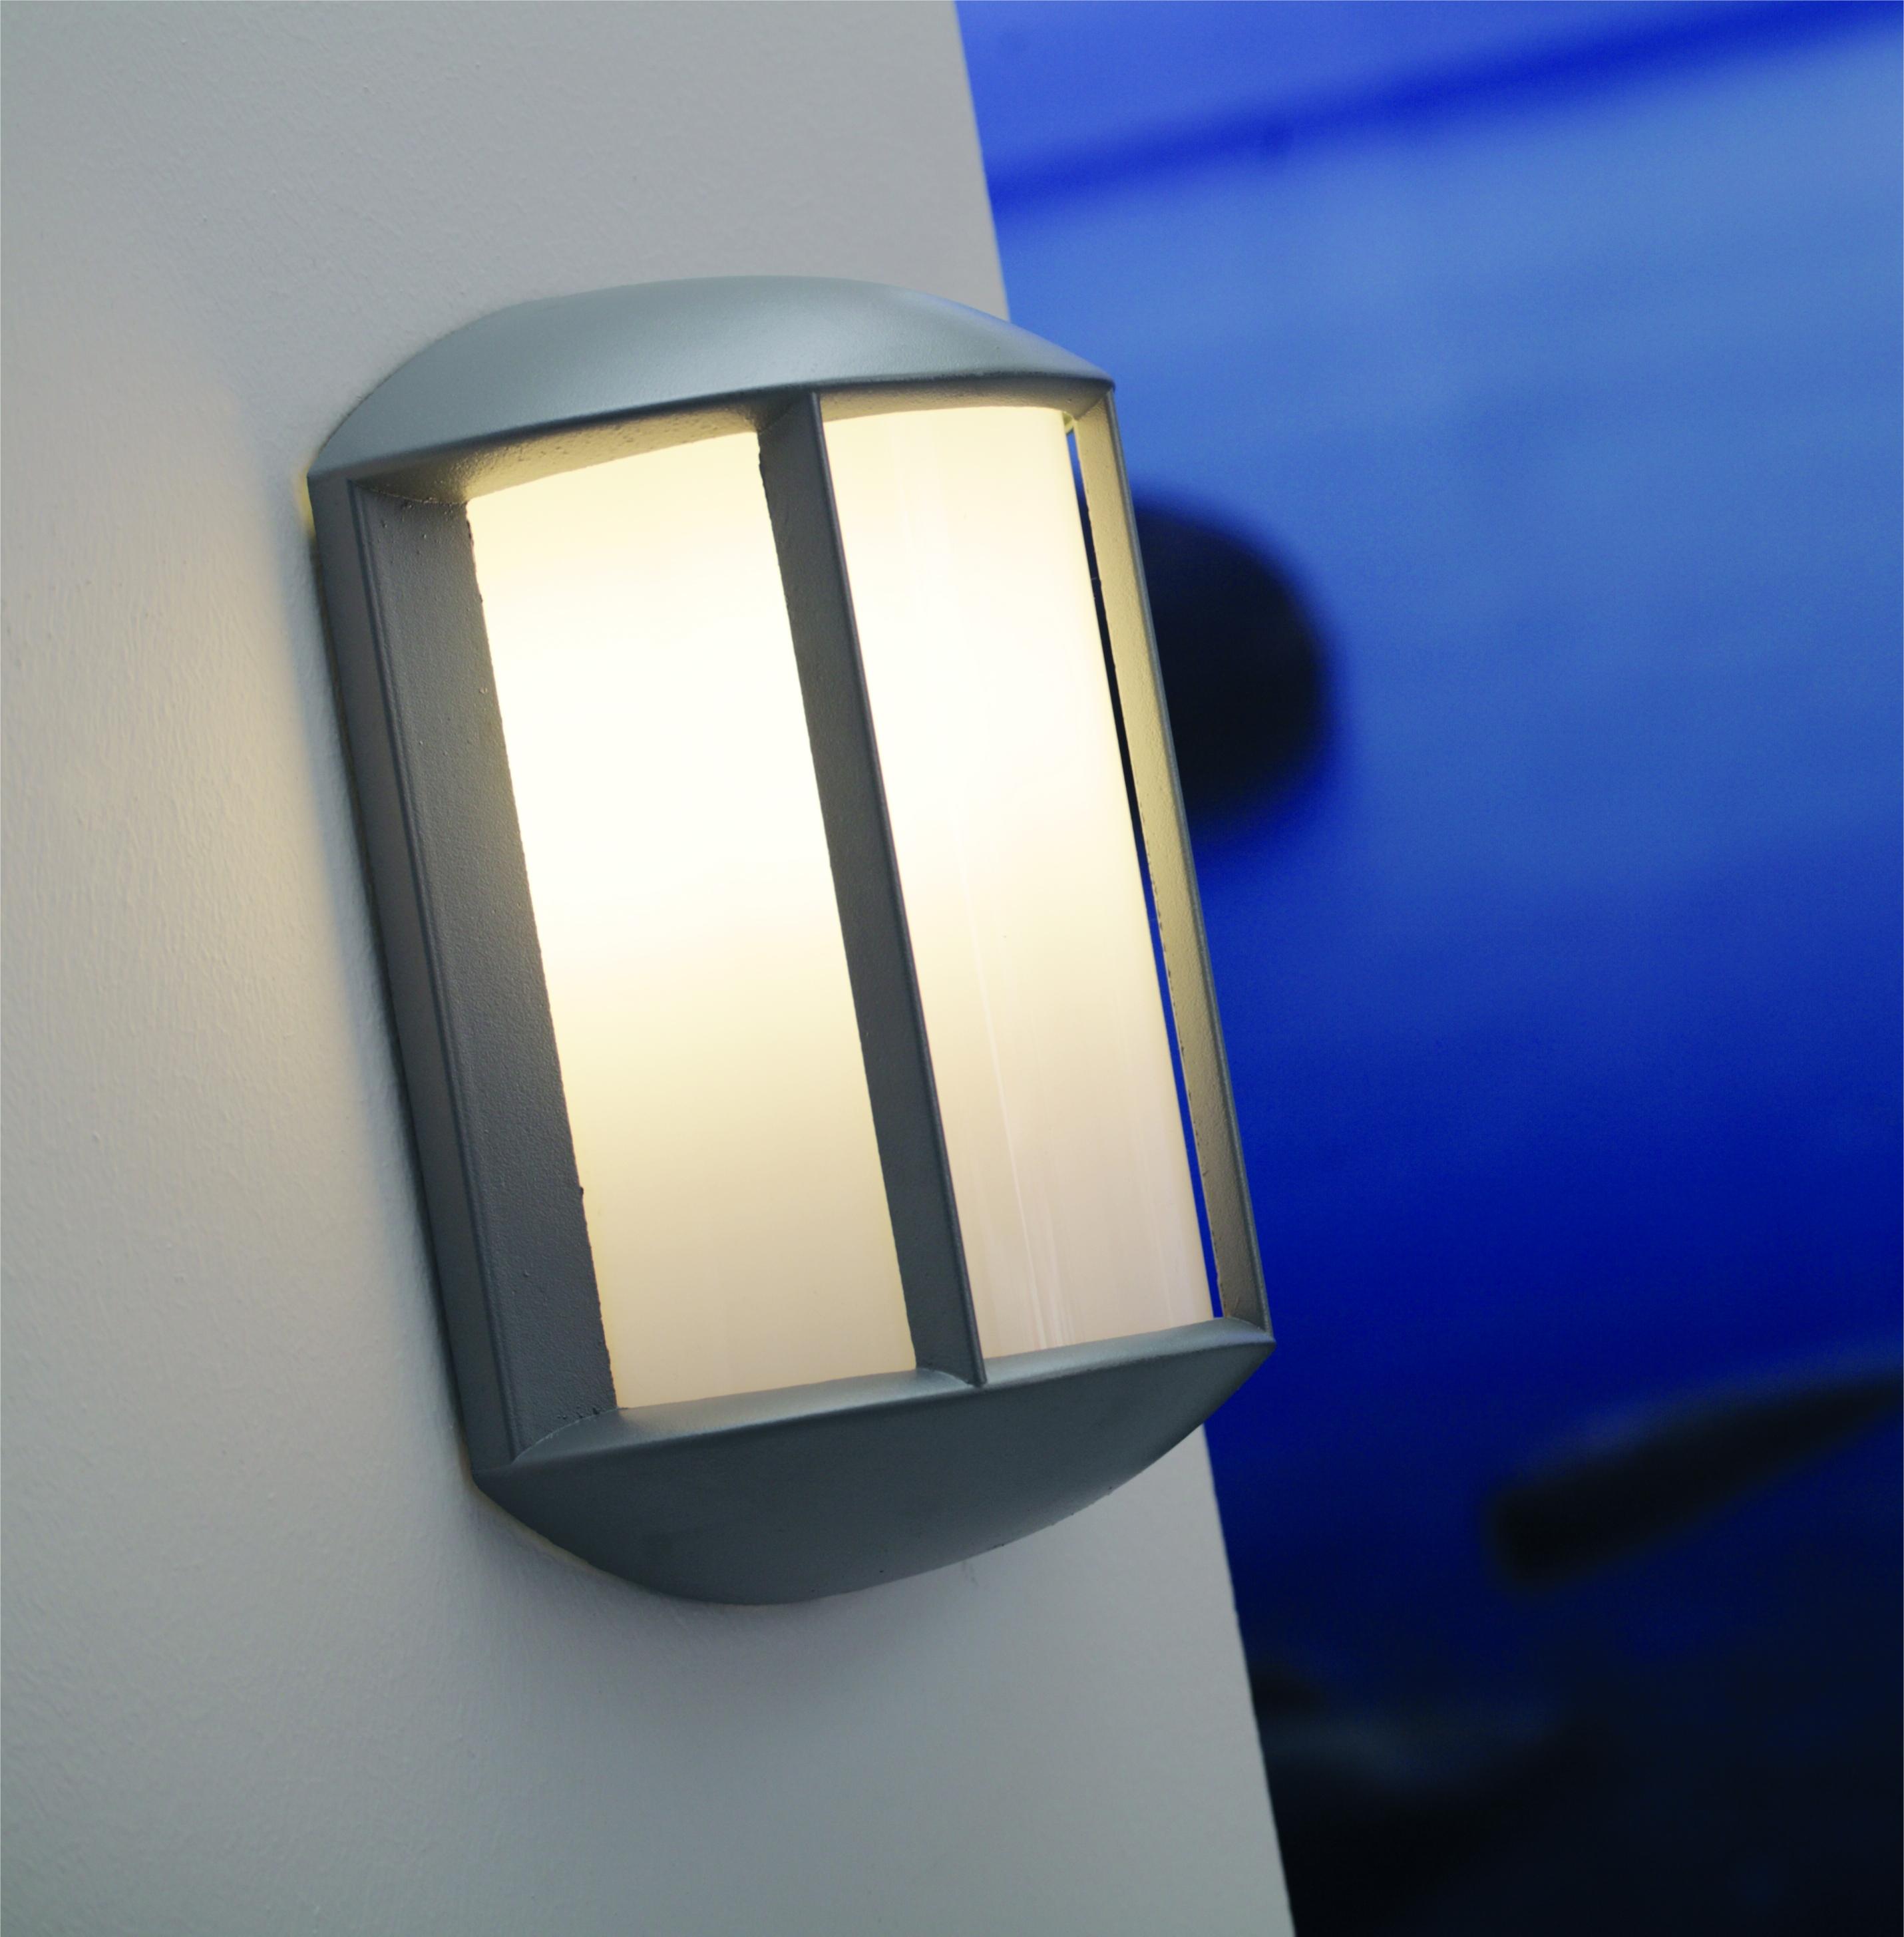 Exterior Wall Light - Black or Grey Finish